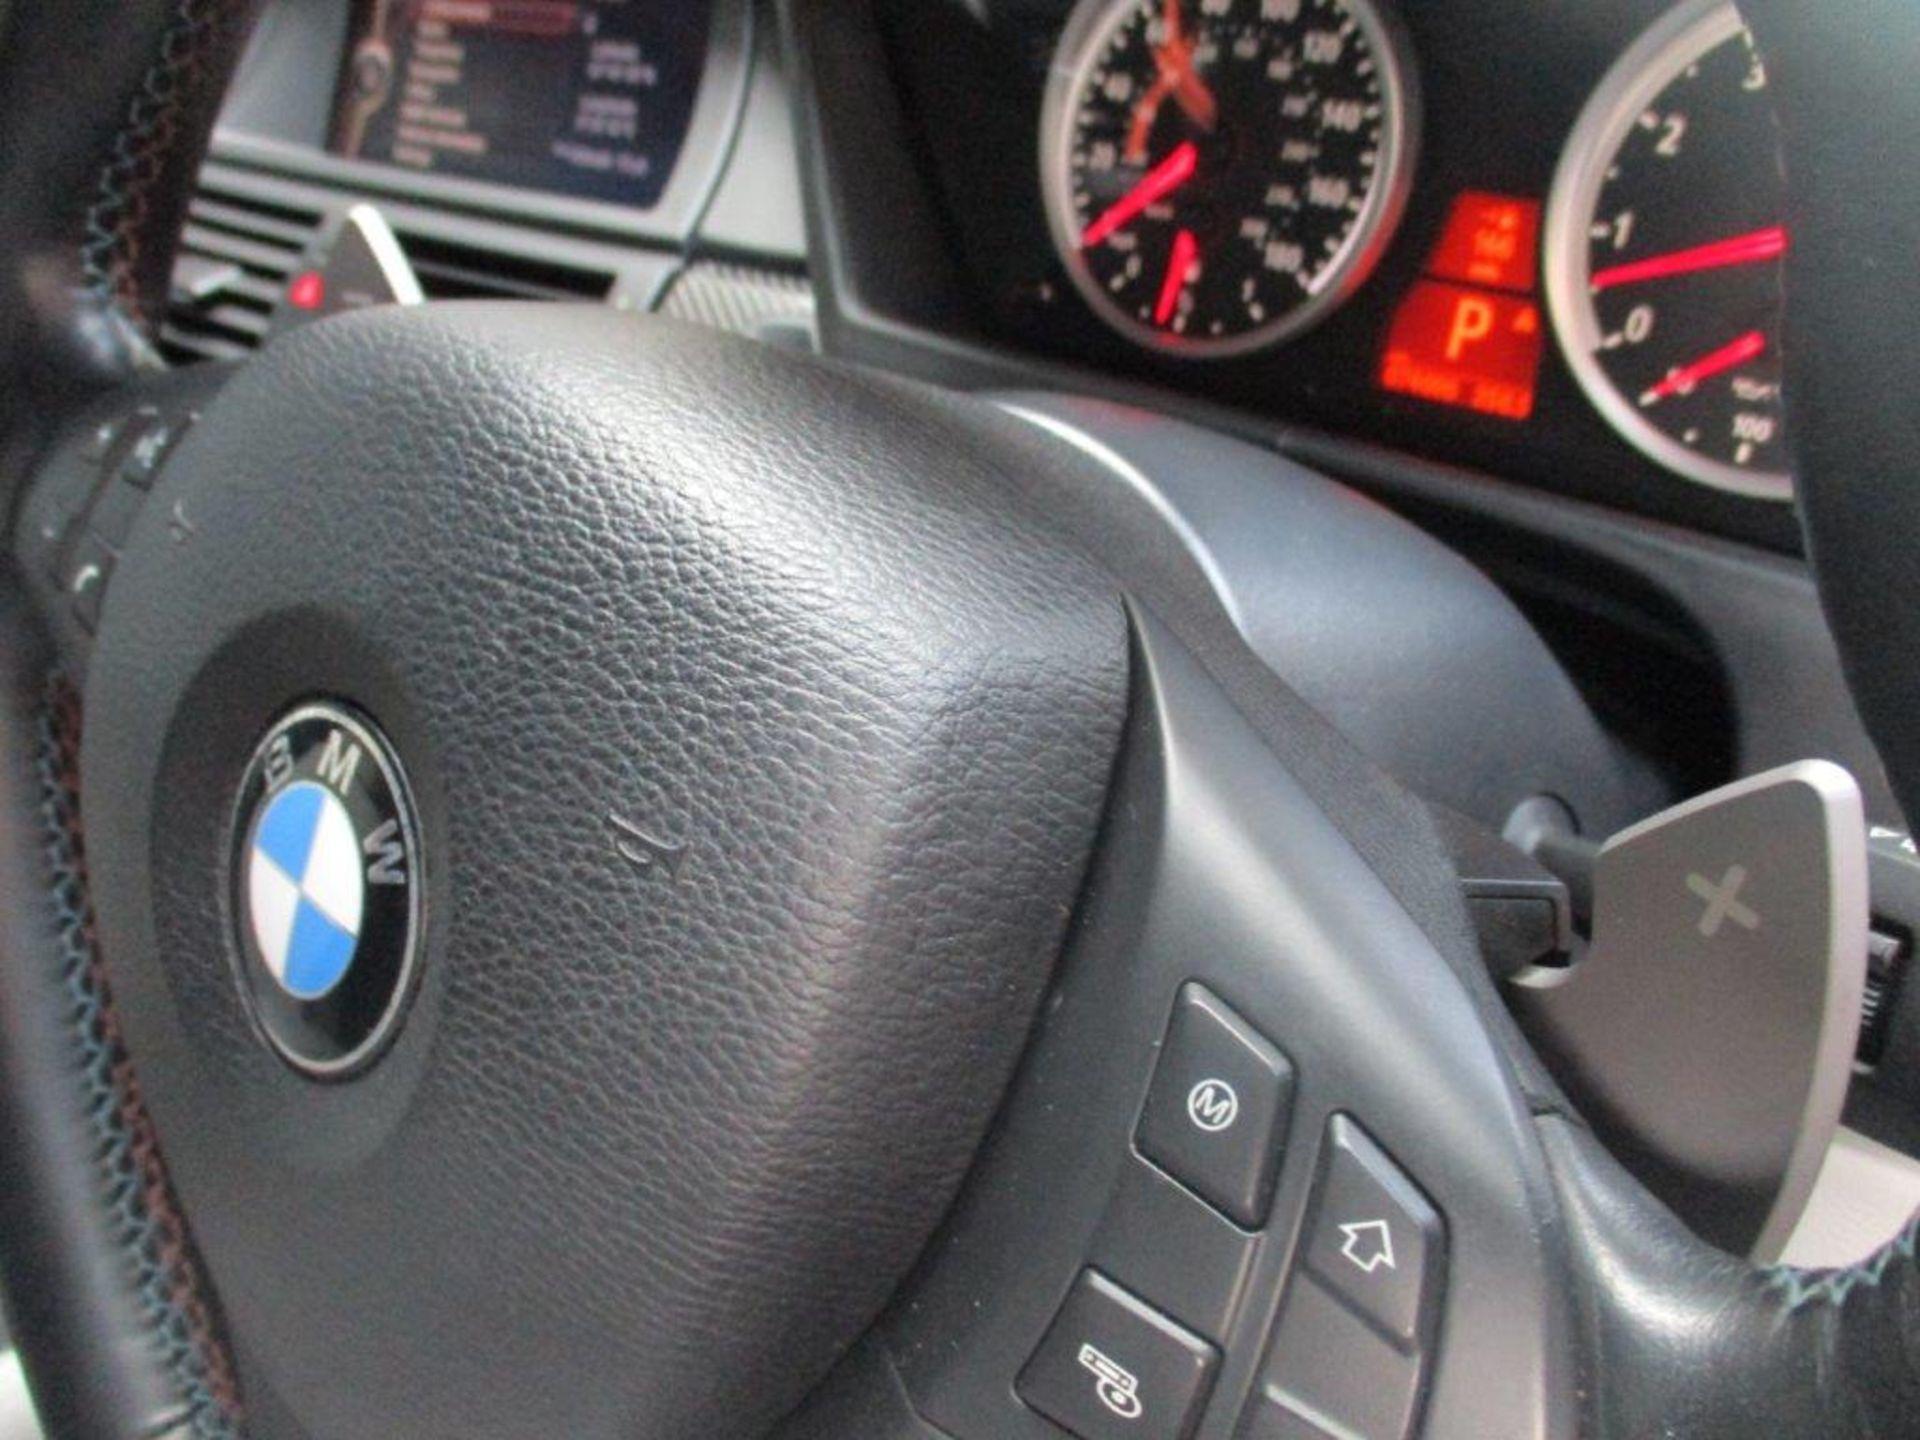 60 10 BMW X5 M Turbo Auto - Image 26 of 35